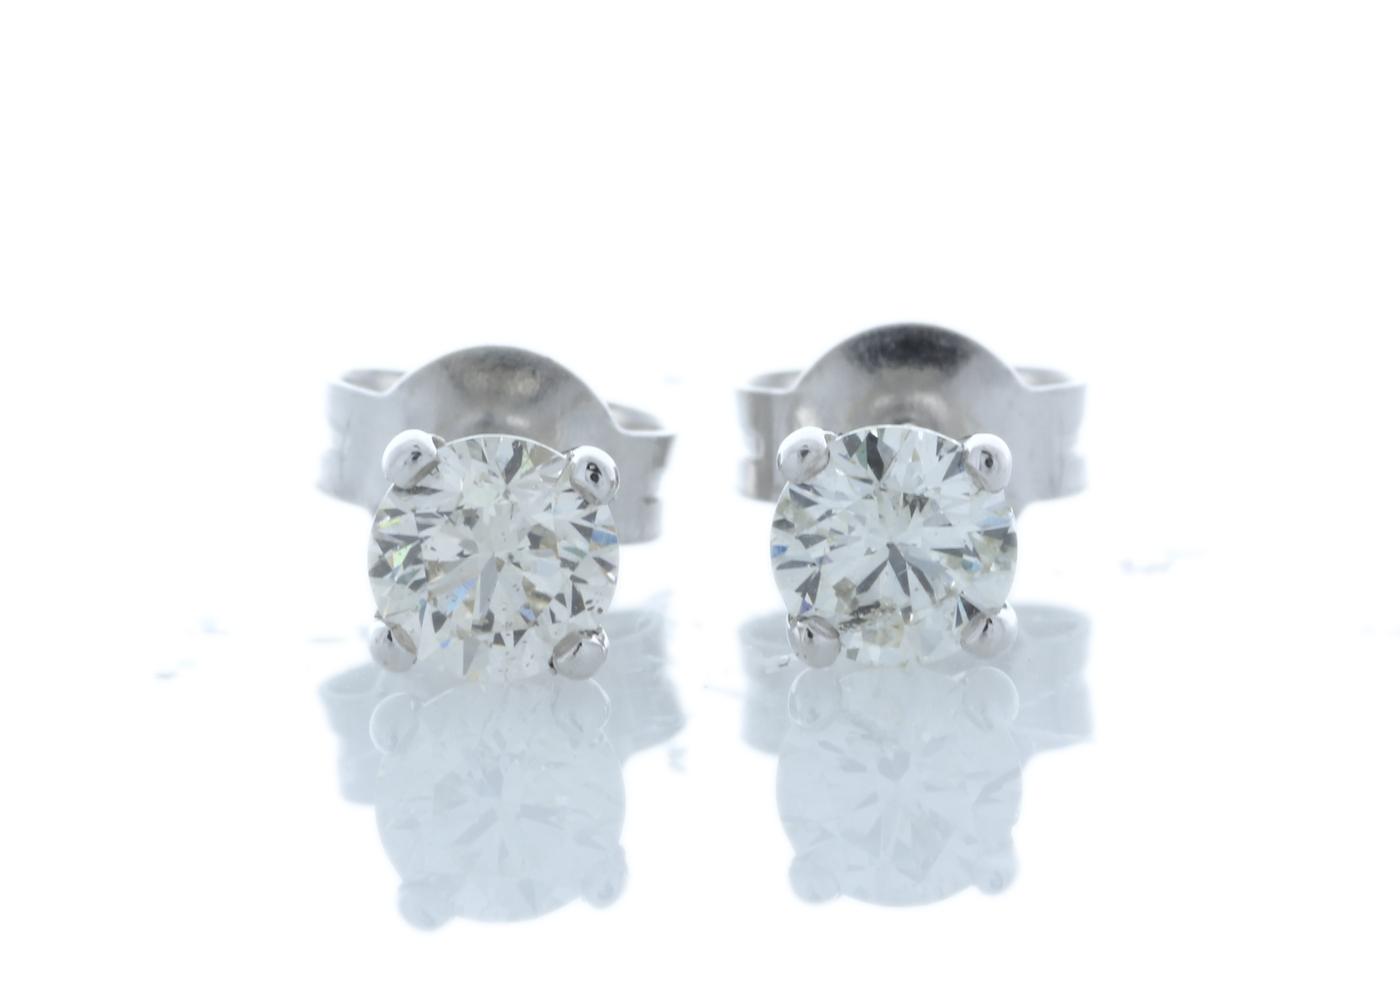 18k White Gold Wire Set Diamond Earrings 0.80 Carats